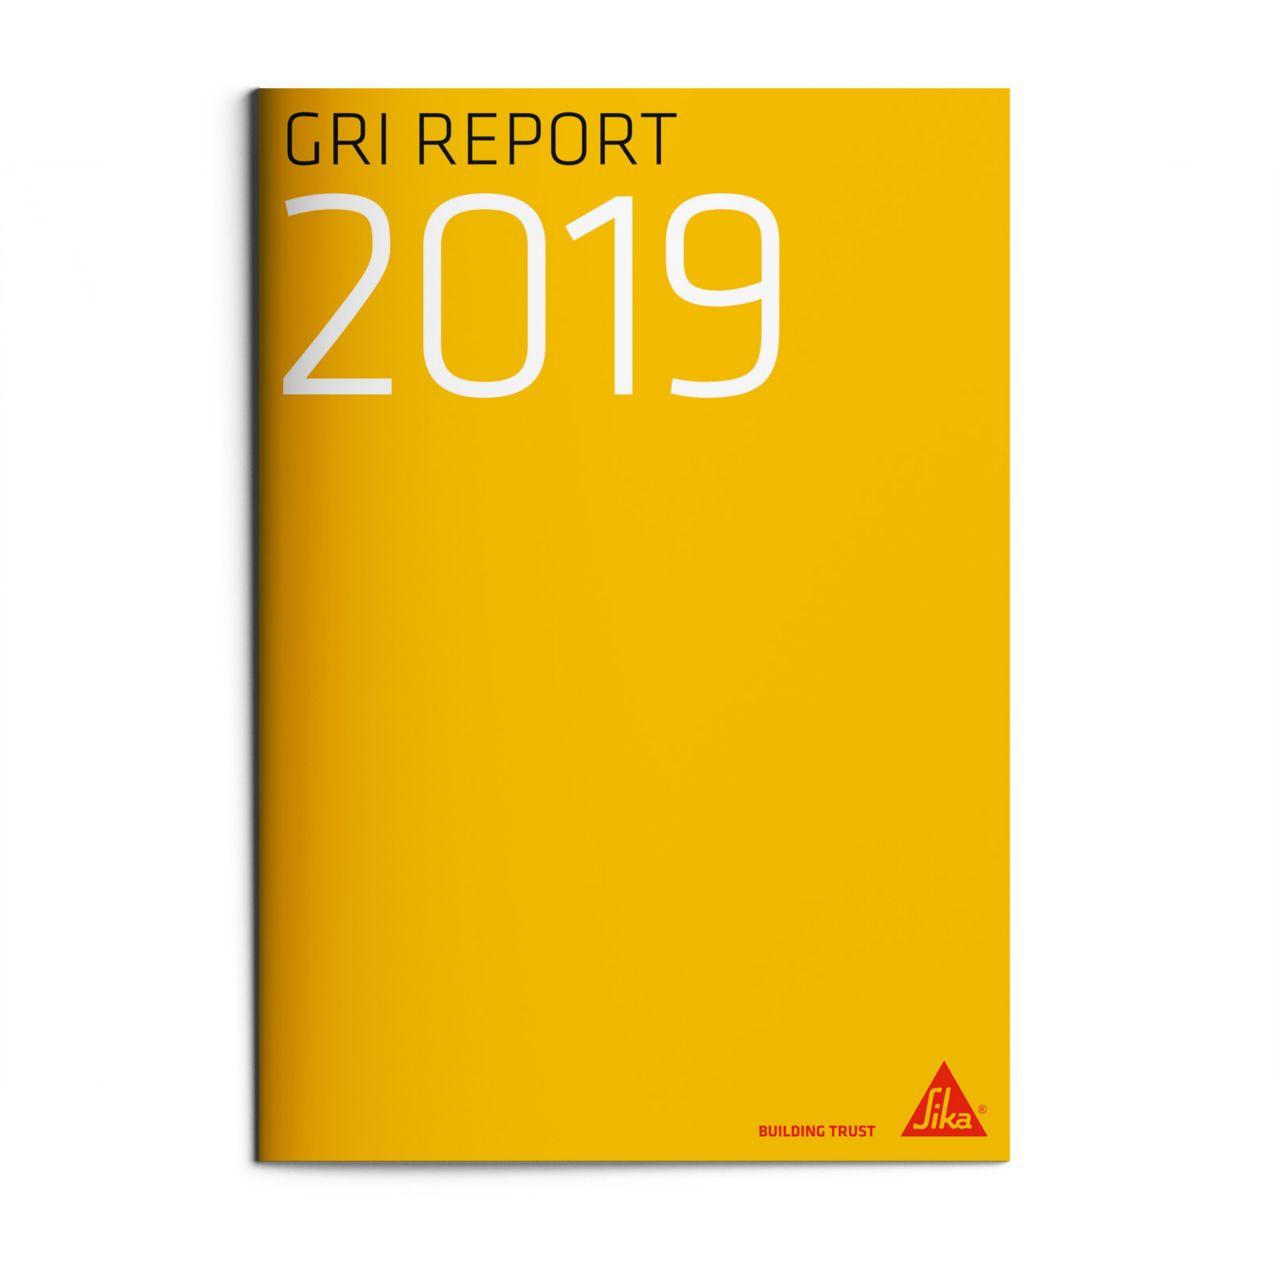 GRI-Bericht Sika Konzern